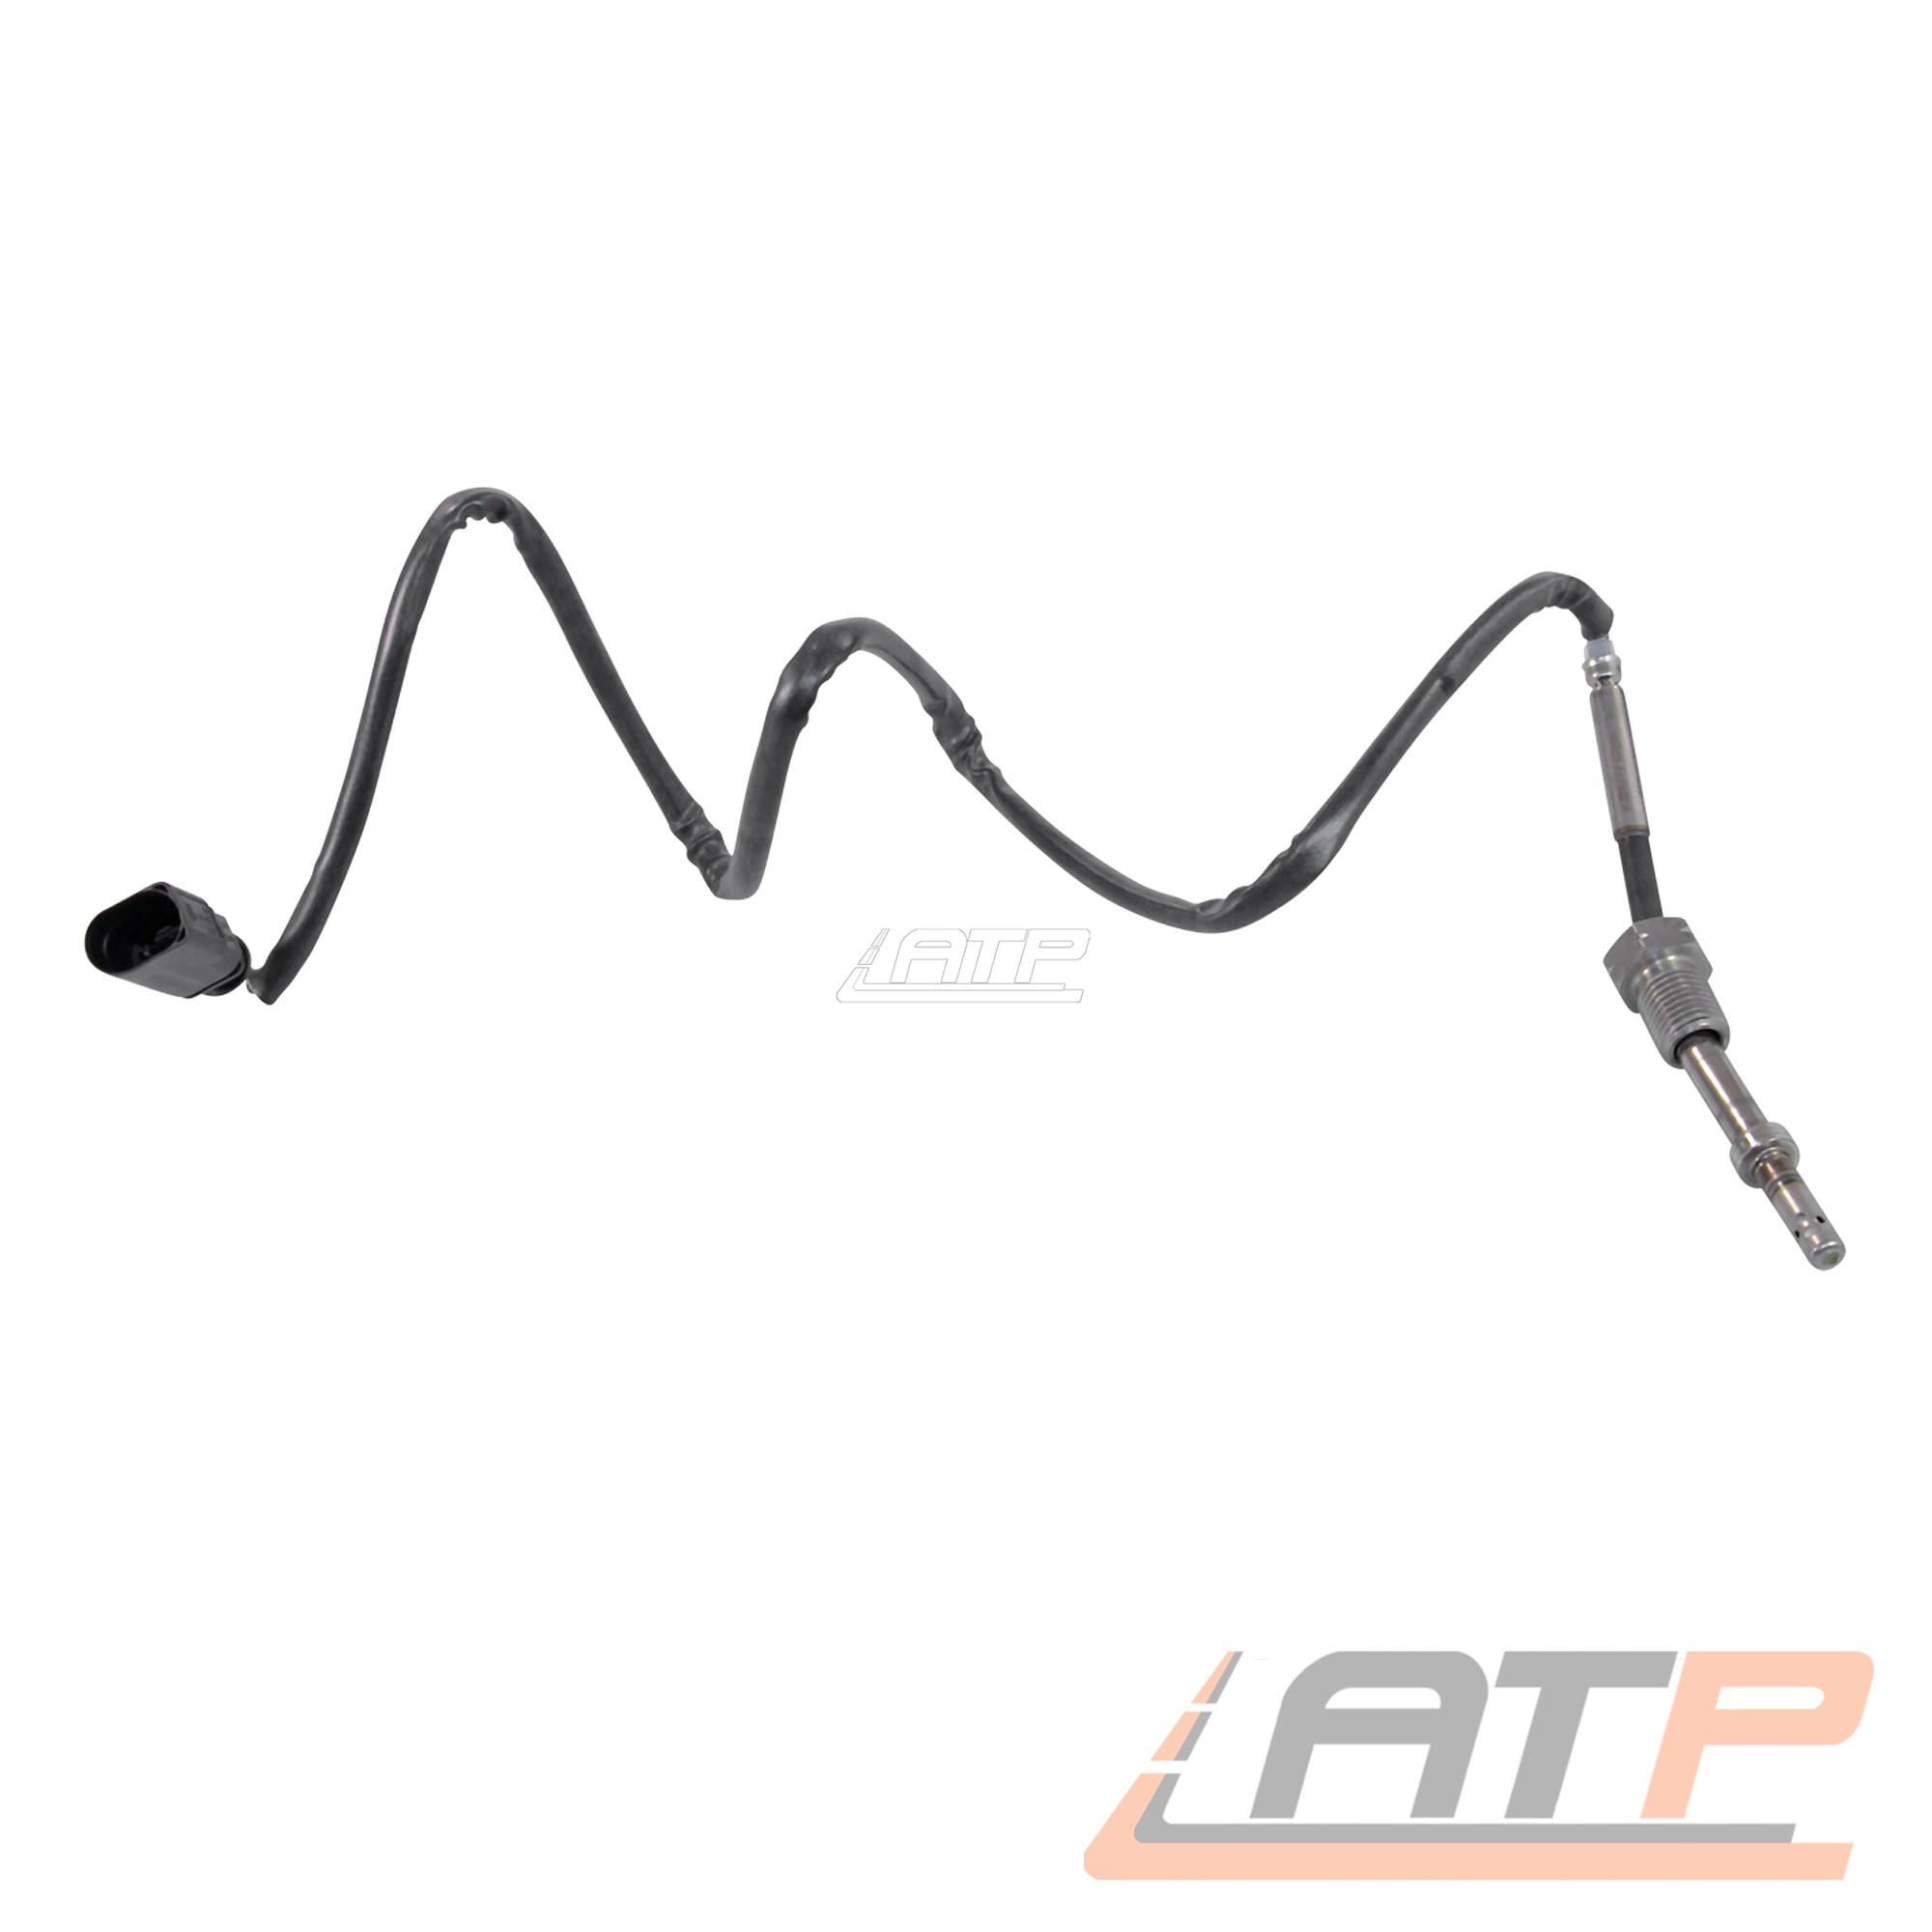 Abgastemperatur Sensor Vor Turbolader Vw Eos 2 0 Tdi Golf